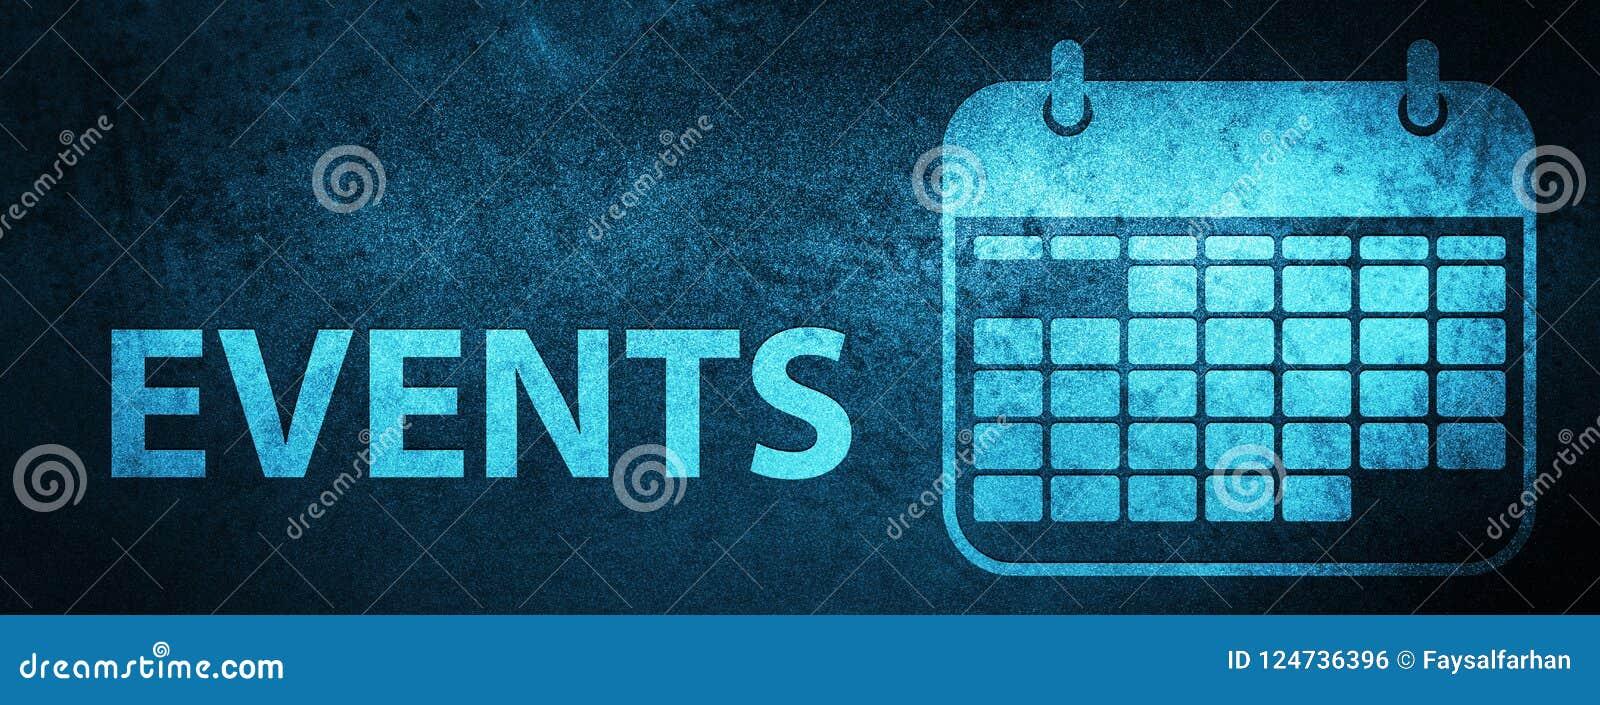 Events Calendar Icon Special Blue Banner Background Stock Illustration Illustration Of Calendar Symbol 124736396